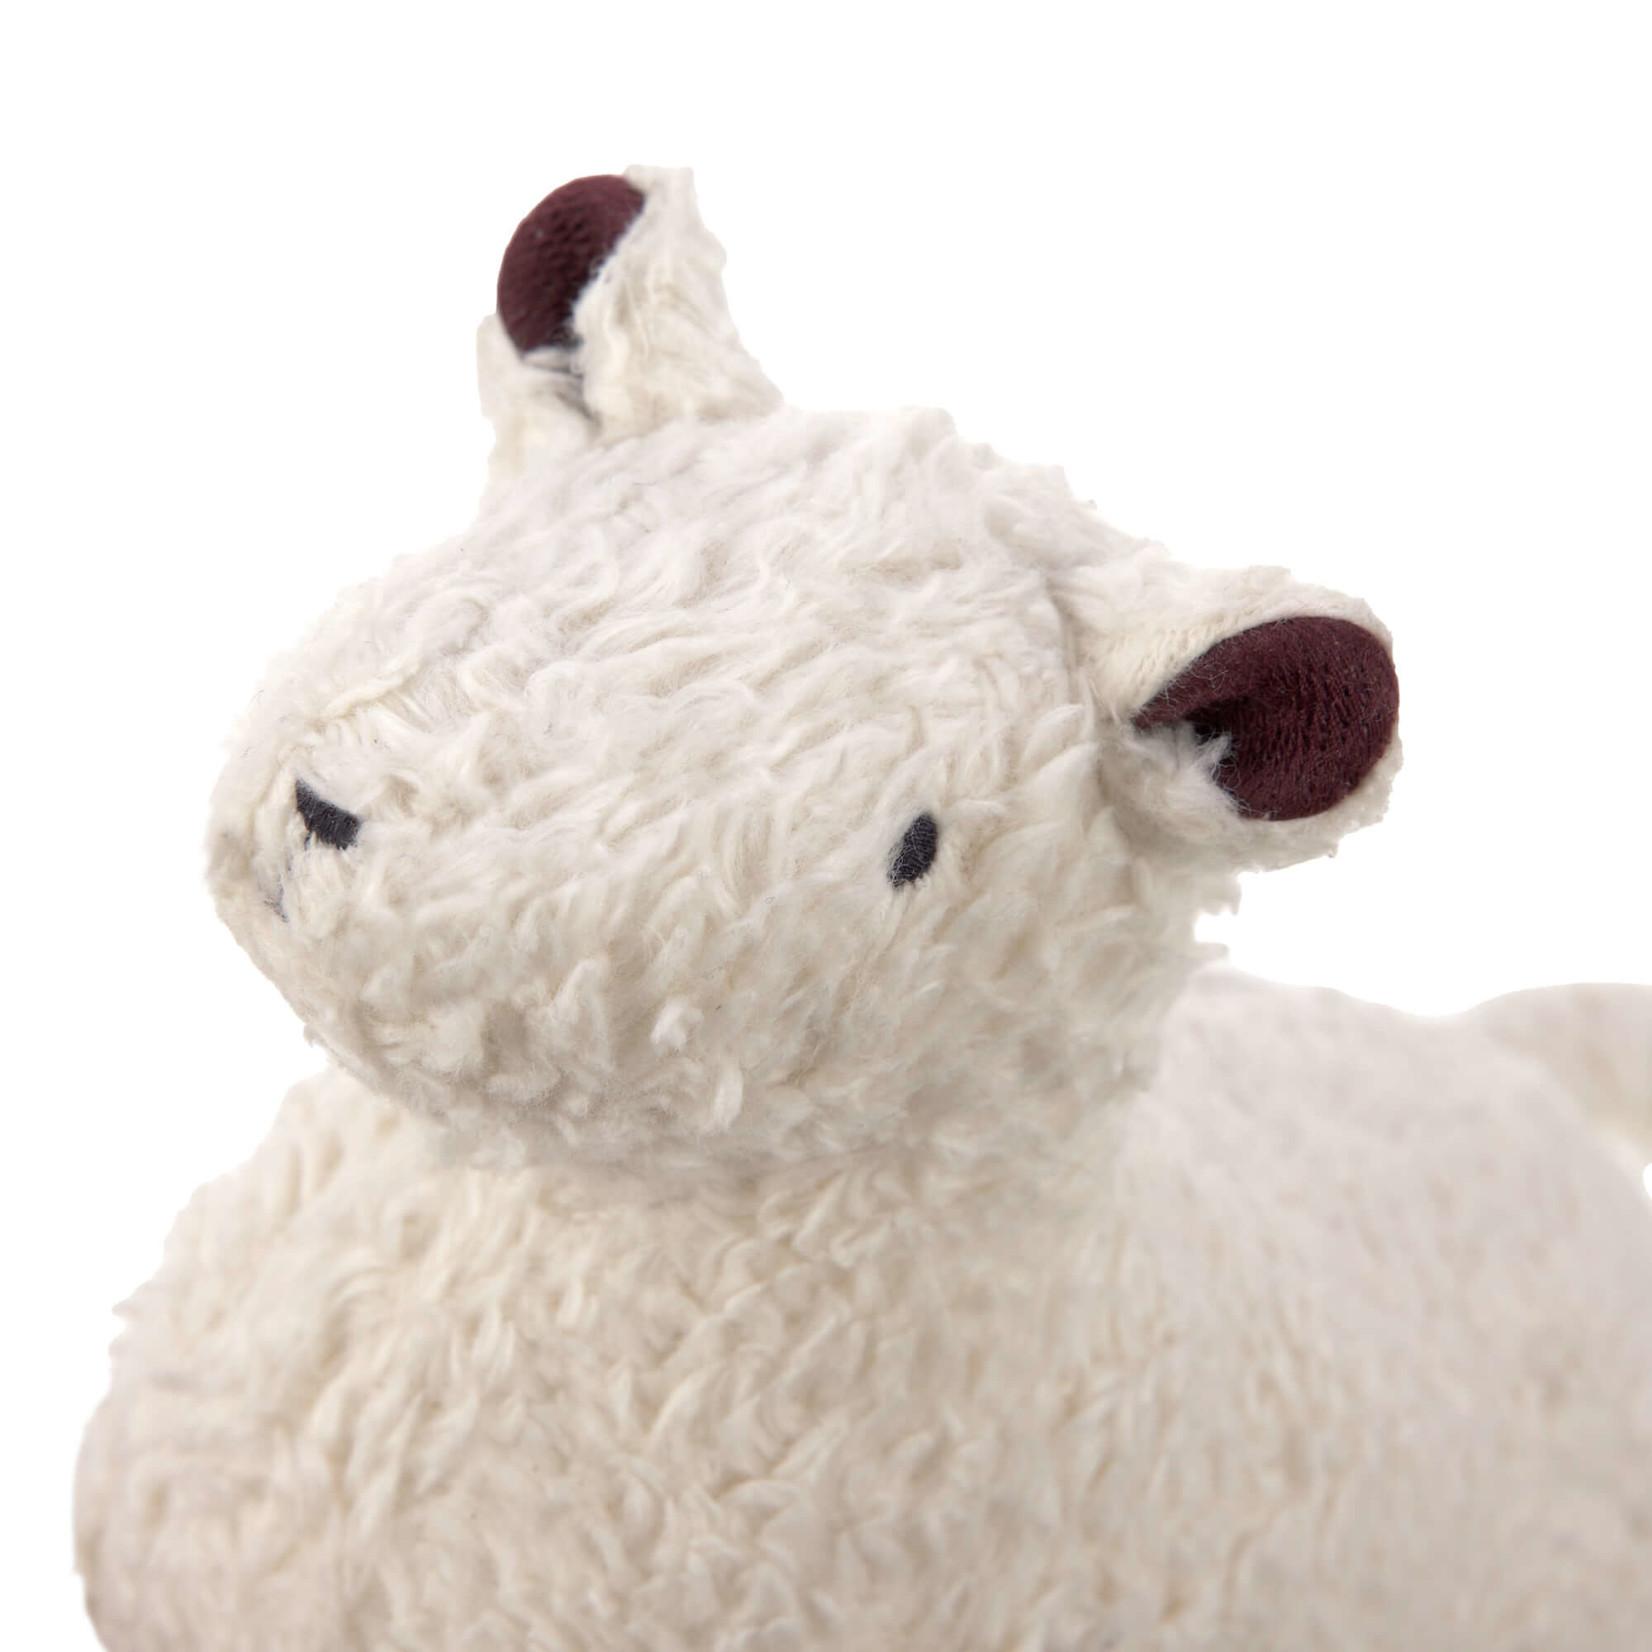 Lässig Digital Music Box with Bluetooth Speaker and USB Cable Tiny Farmer Sheep